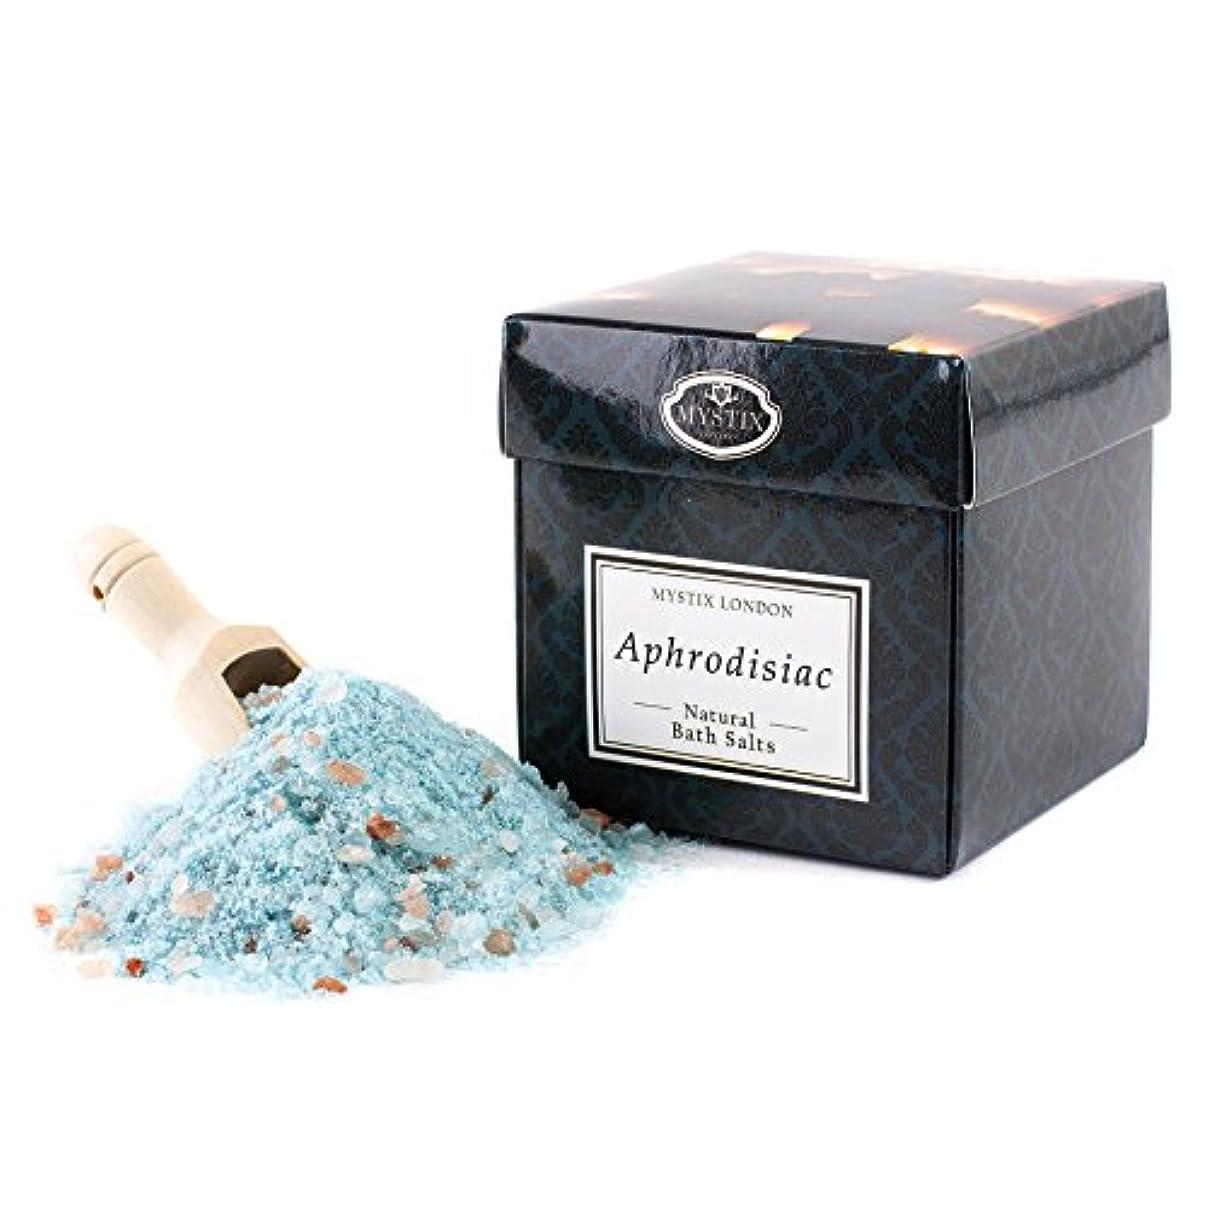 Mystix London | Aphrodisiac Bath Salt - 350g